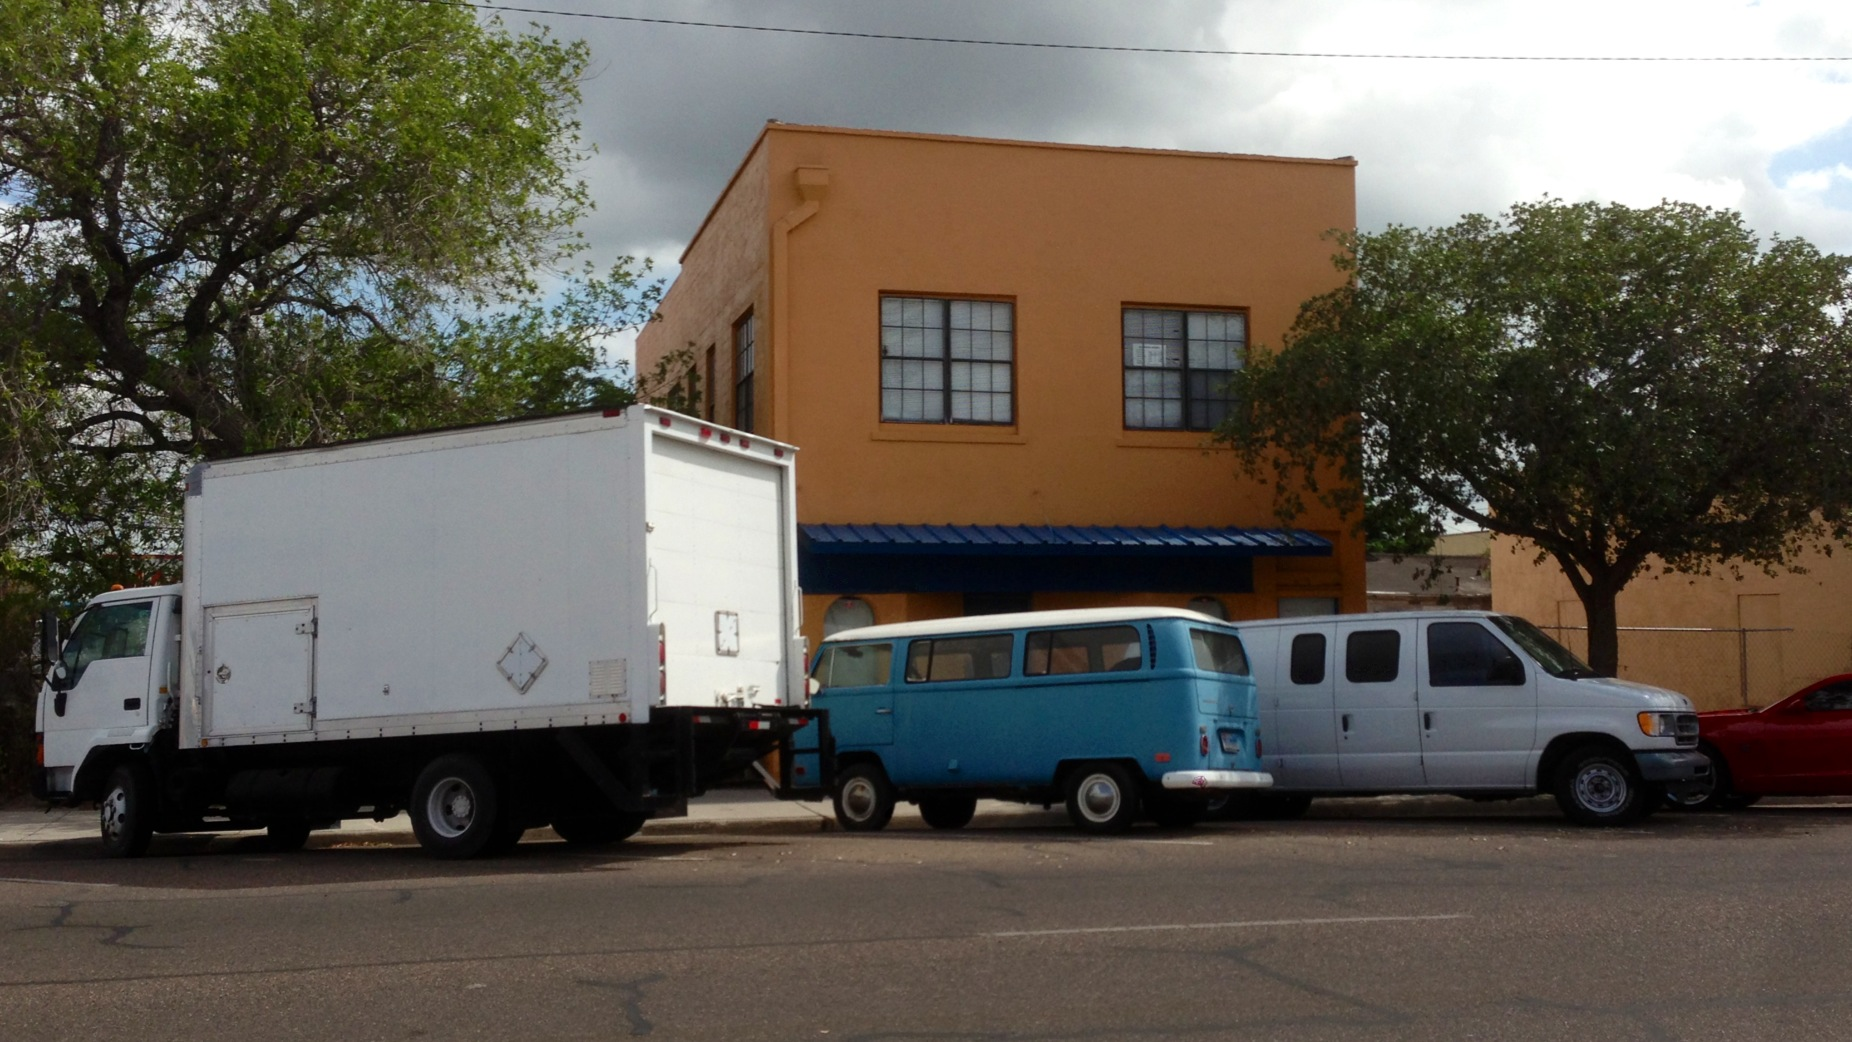 Marcon Business Systems, 405 W Van Buren Ave, Harlingen, Texas, 78550, United States